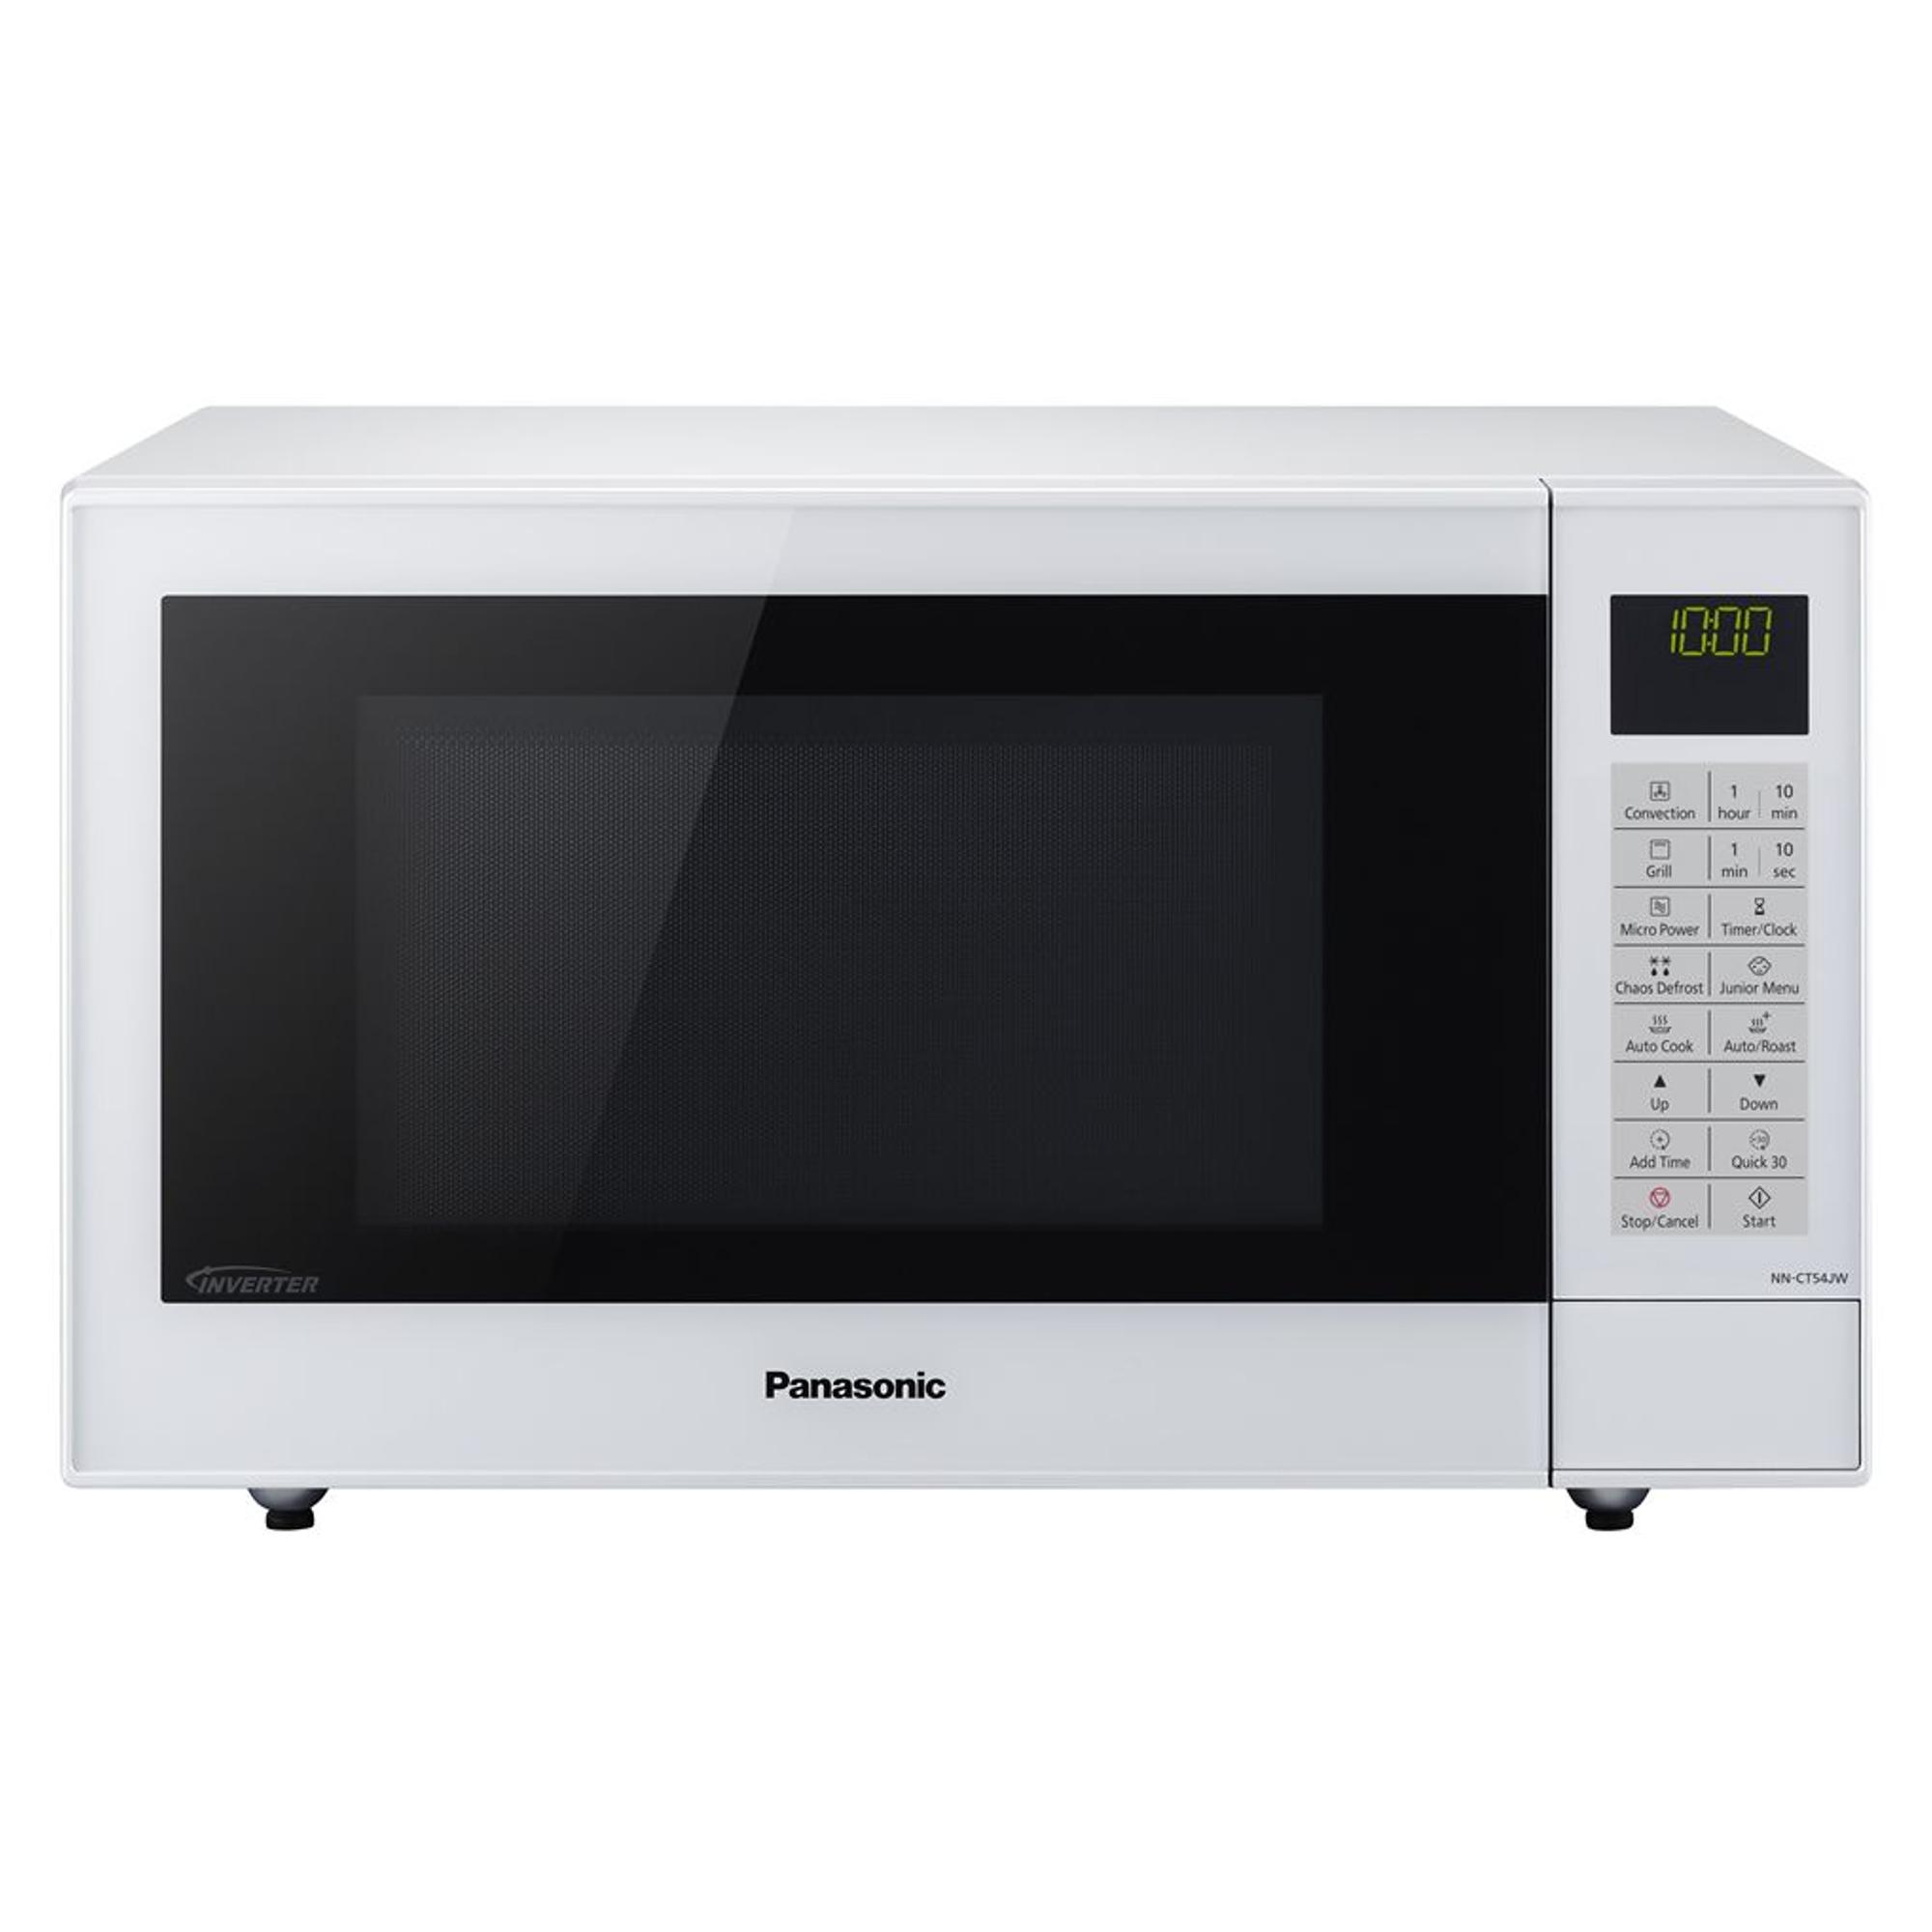 nnct54jwbpq 1000w combination microwave